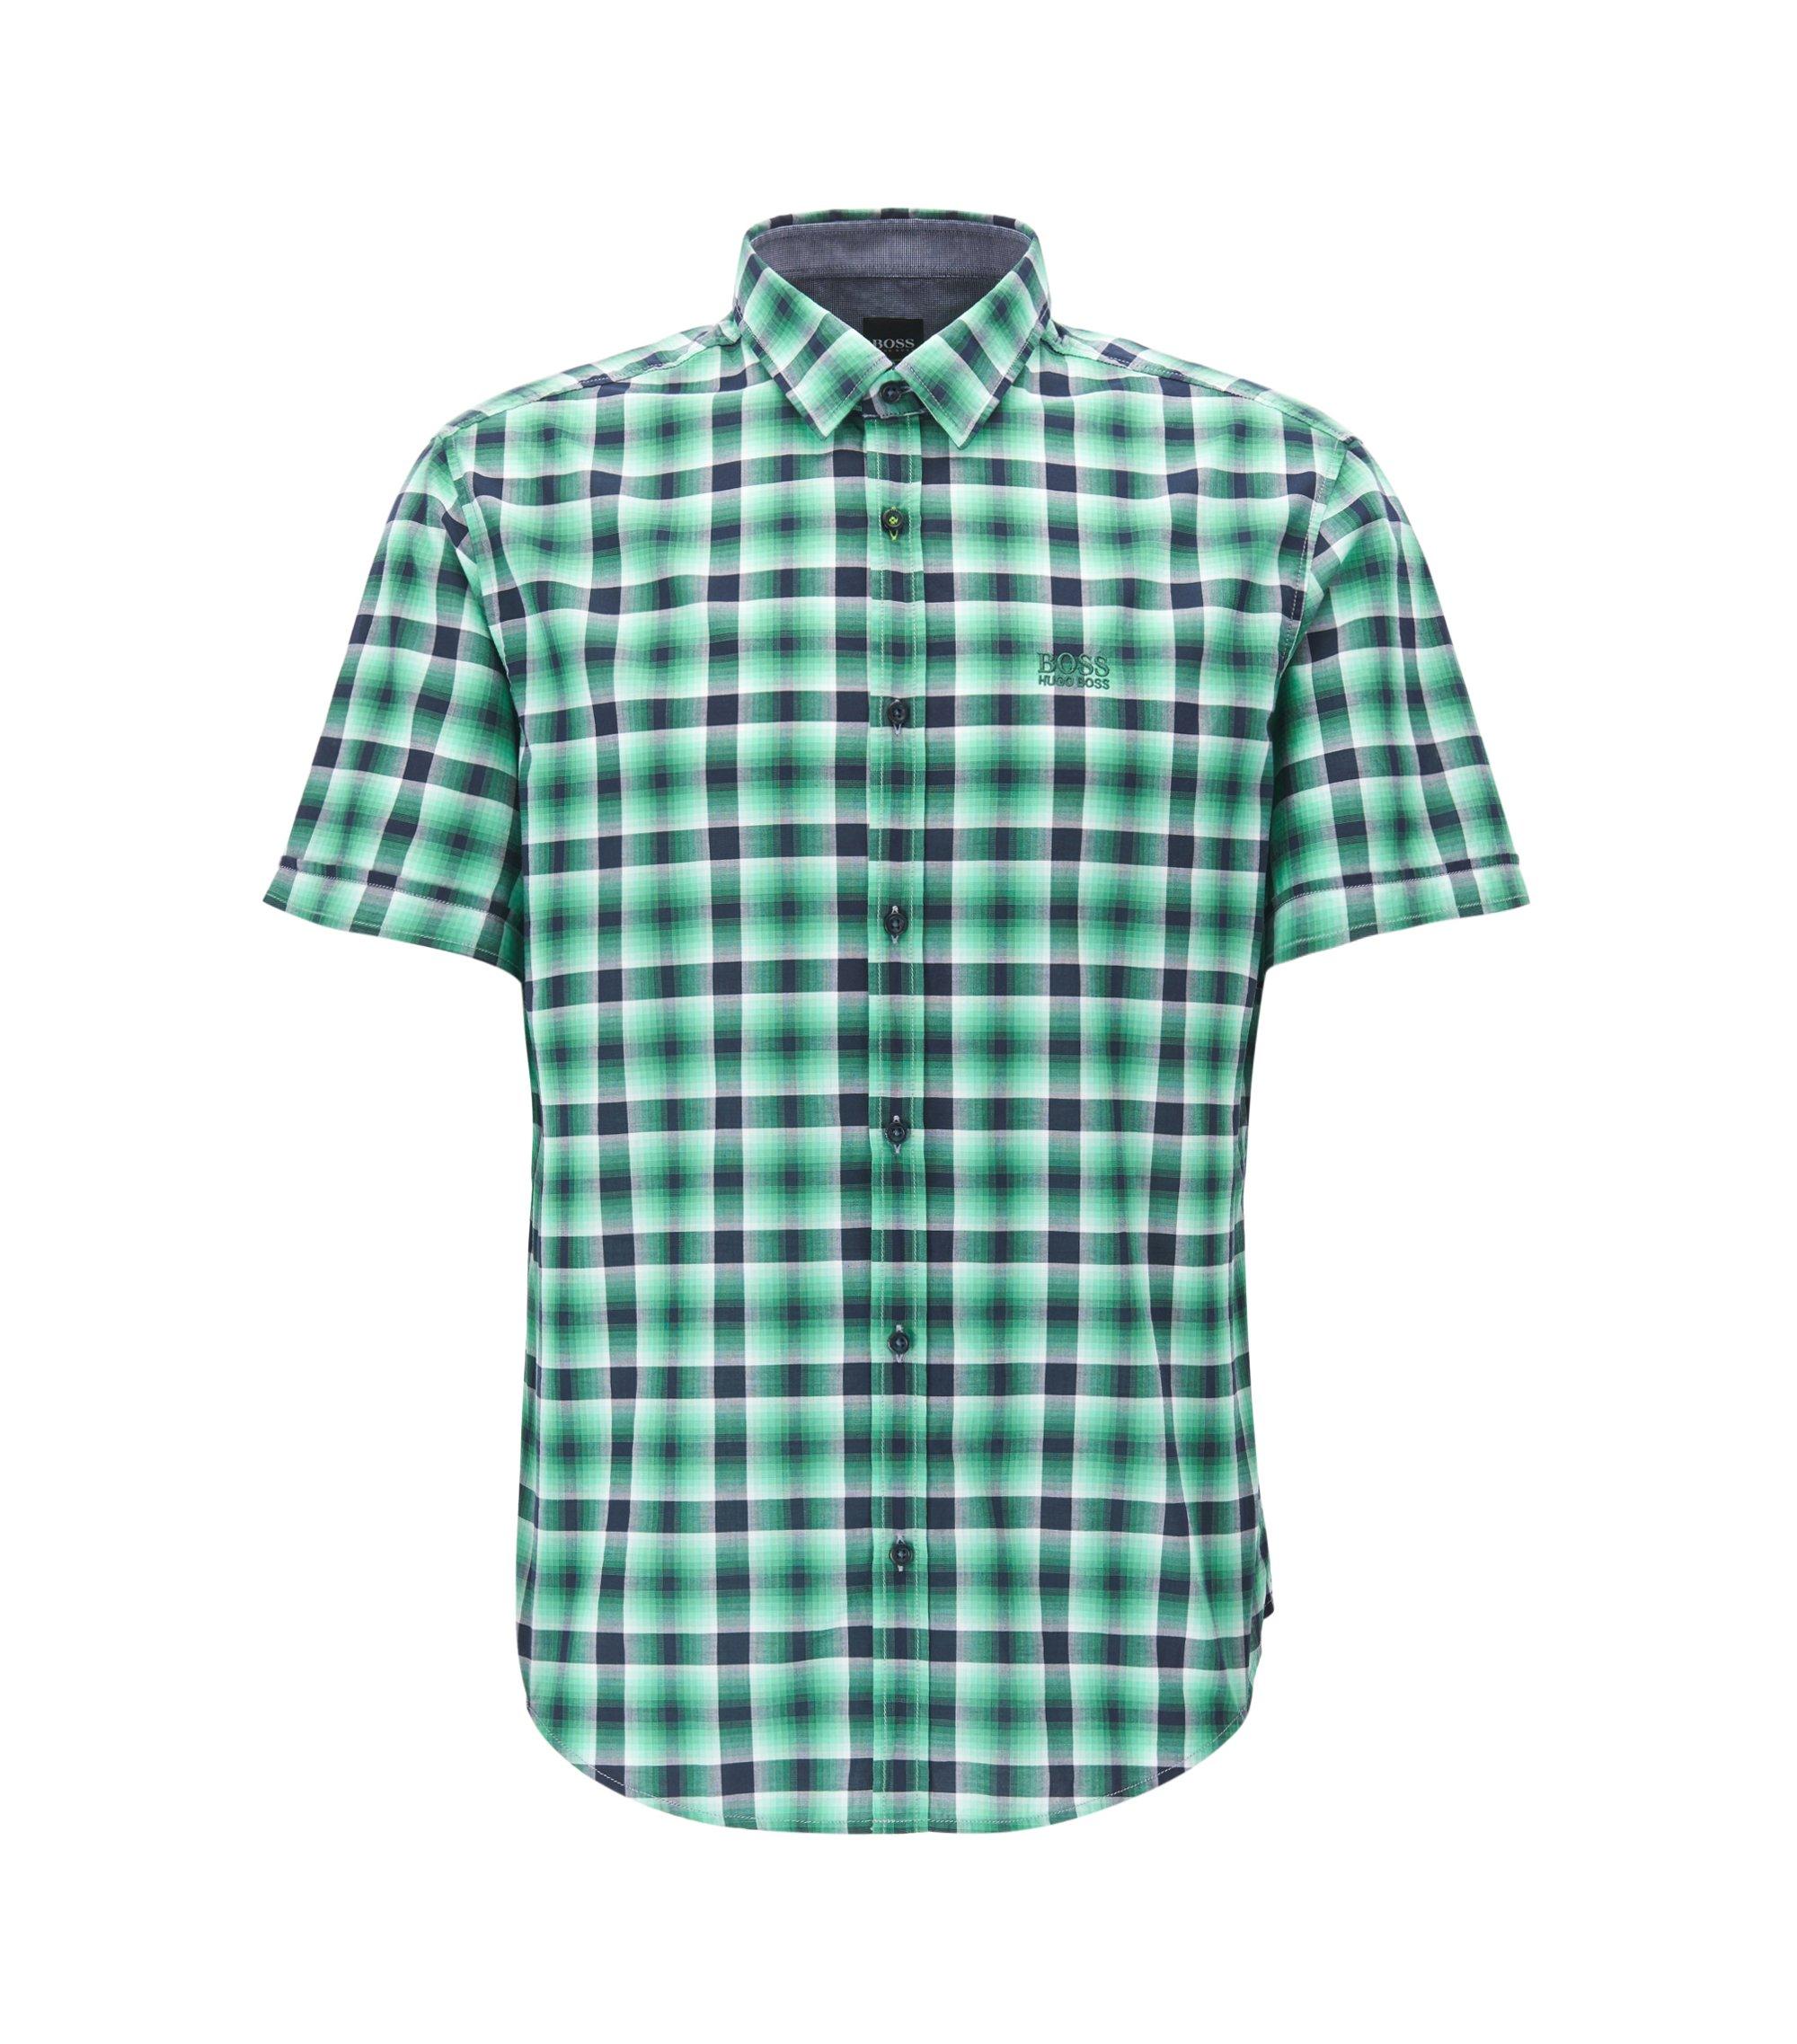 Camisa de manga corta regular fit en algodón a cuadros, Verde